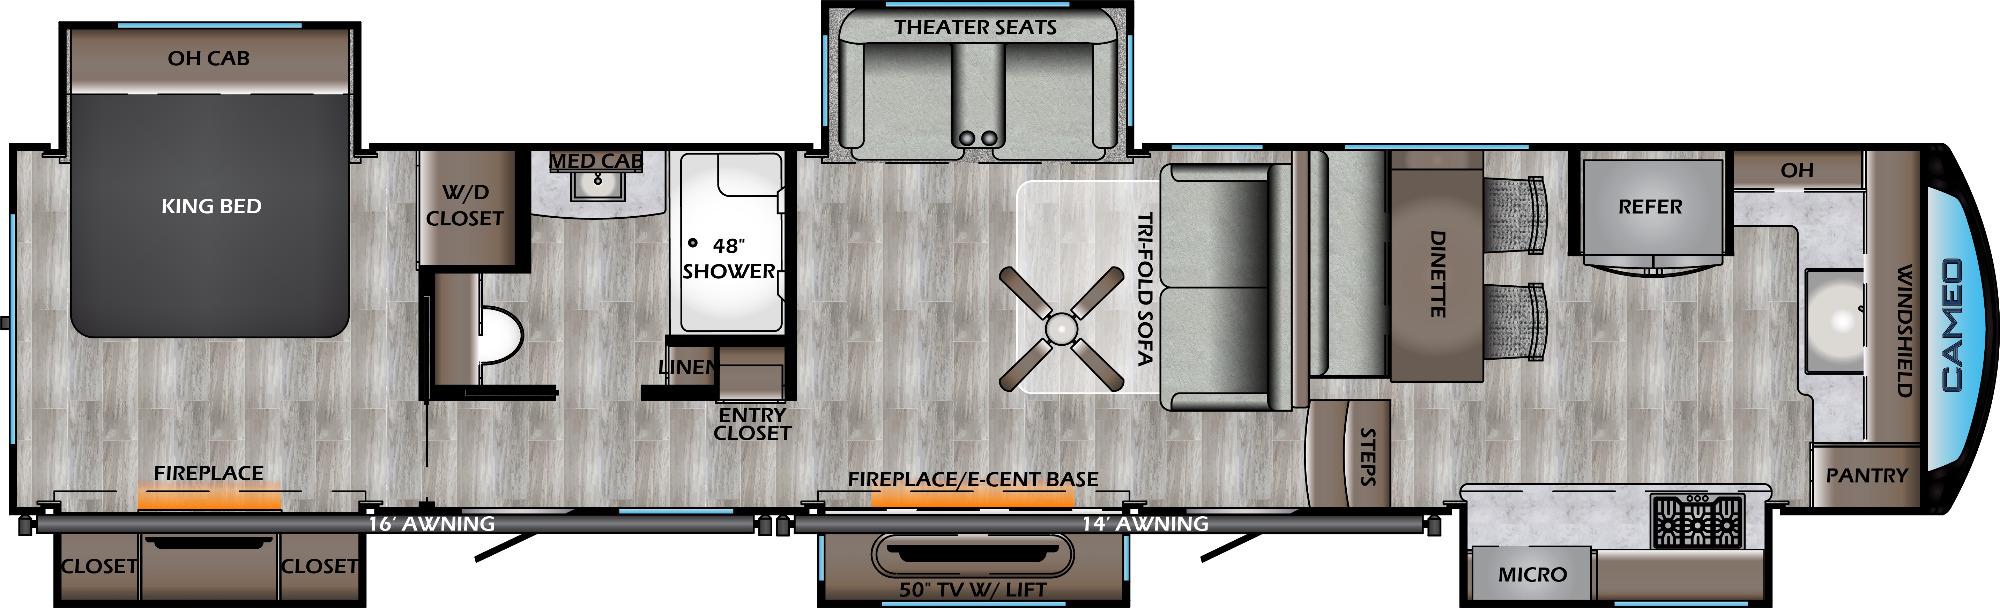 View Floor Plan for 2021 CROSSROADS CAMEO 4021FK